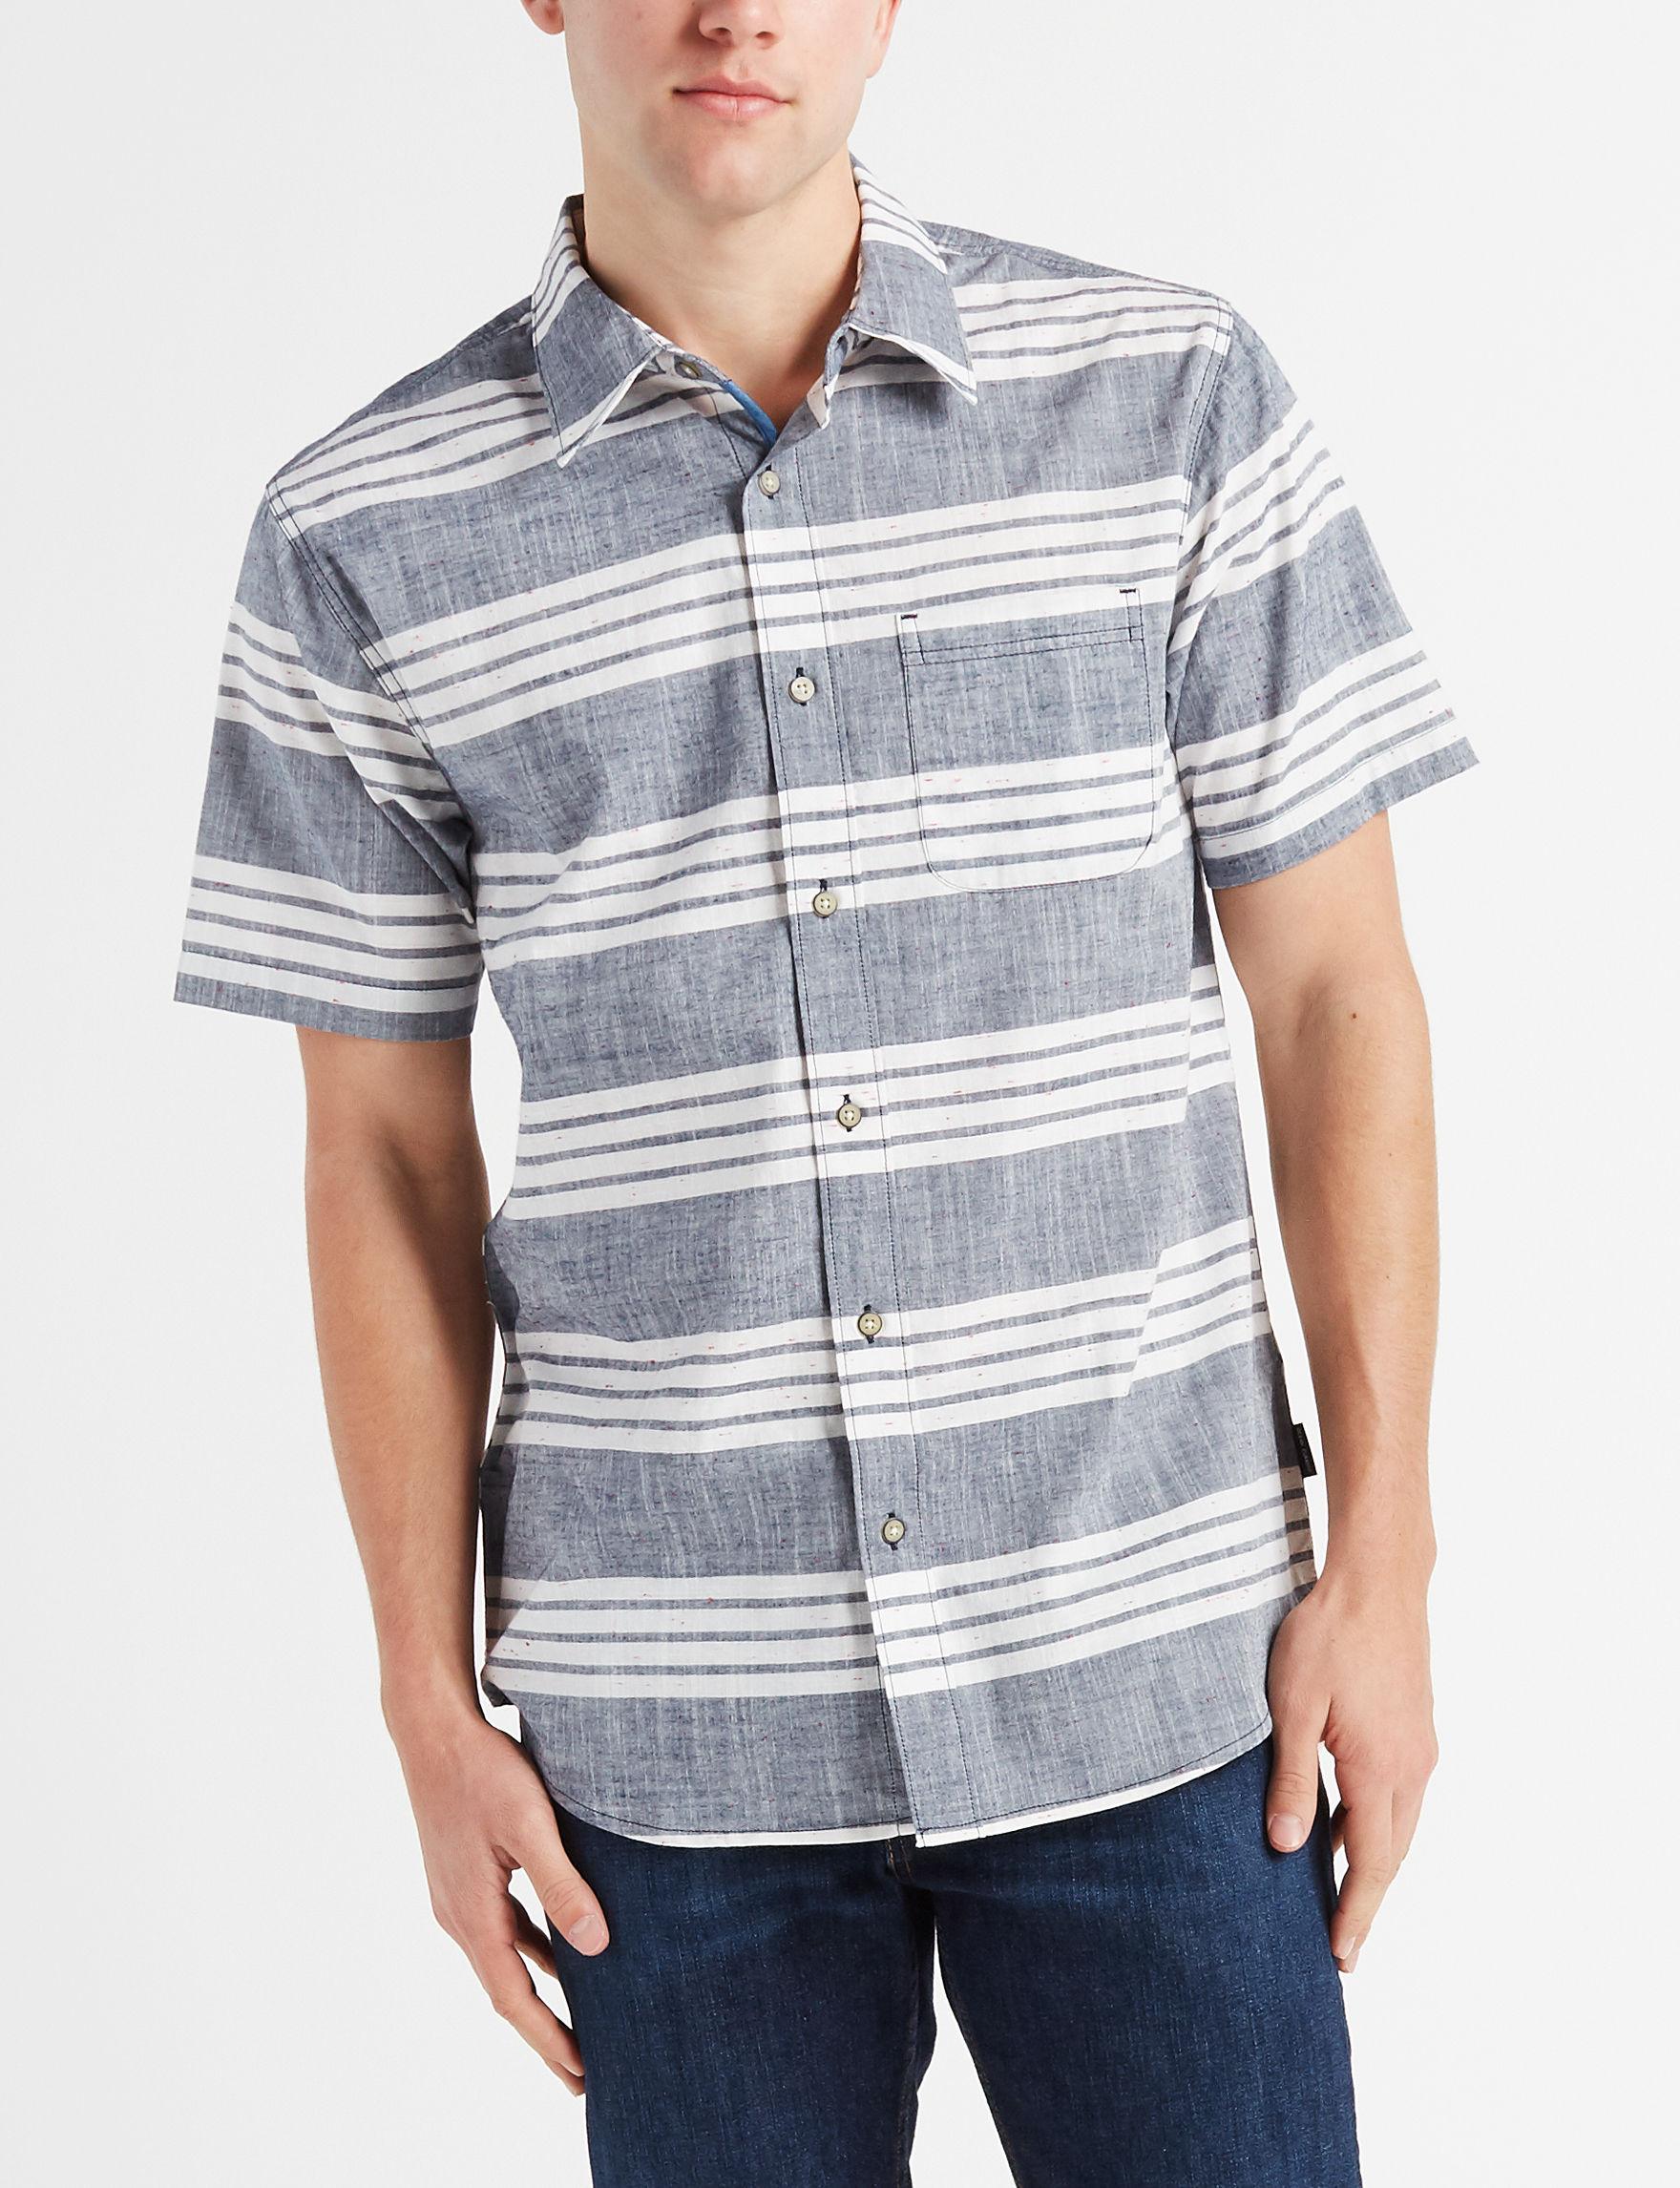 Ocean Current Indigo Casual Button Down Shirts